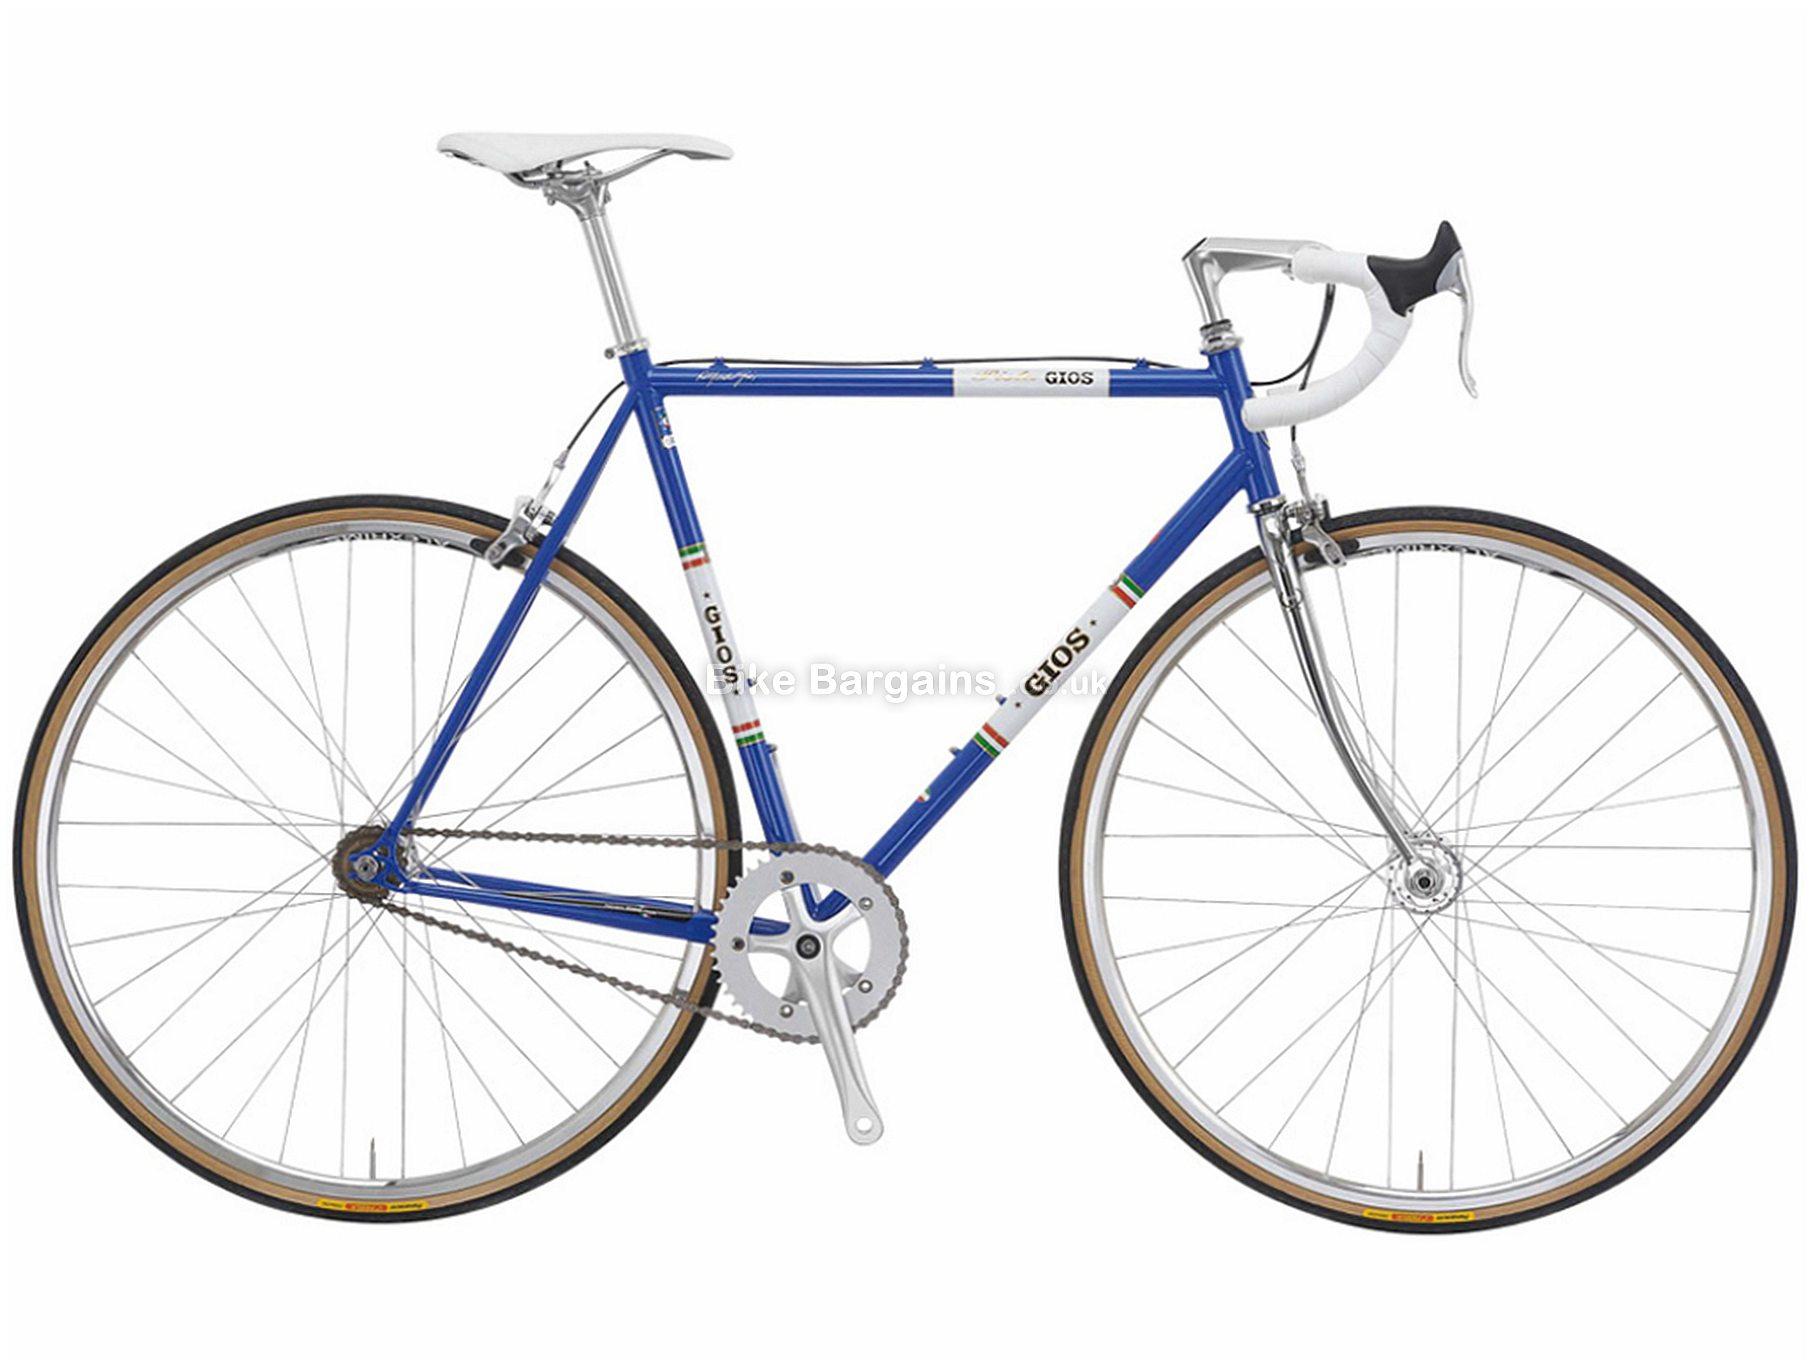 499 Gios Vintage Pista Single Speed Steel Road Bike Save 370